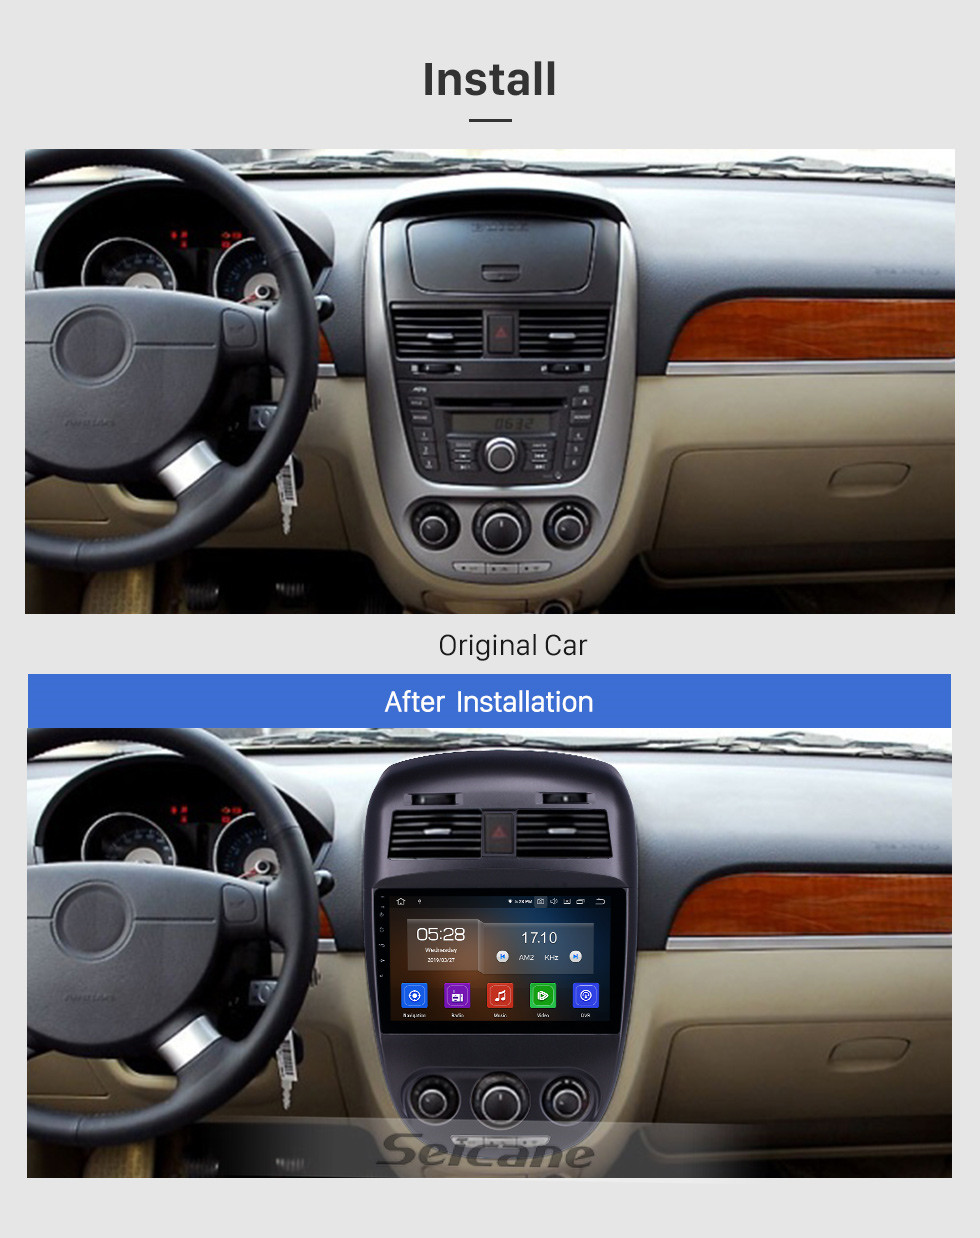 Seicane 10,1 Zoll Android 10.0 Radio für 2008-2018 Buick Excelle mit Bluetooth HD Touchscreen GPS-Navigation Carplay-Unterstützung DAB + TPMS